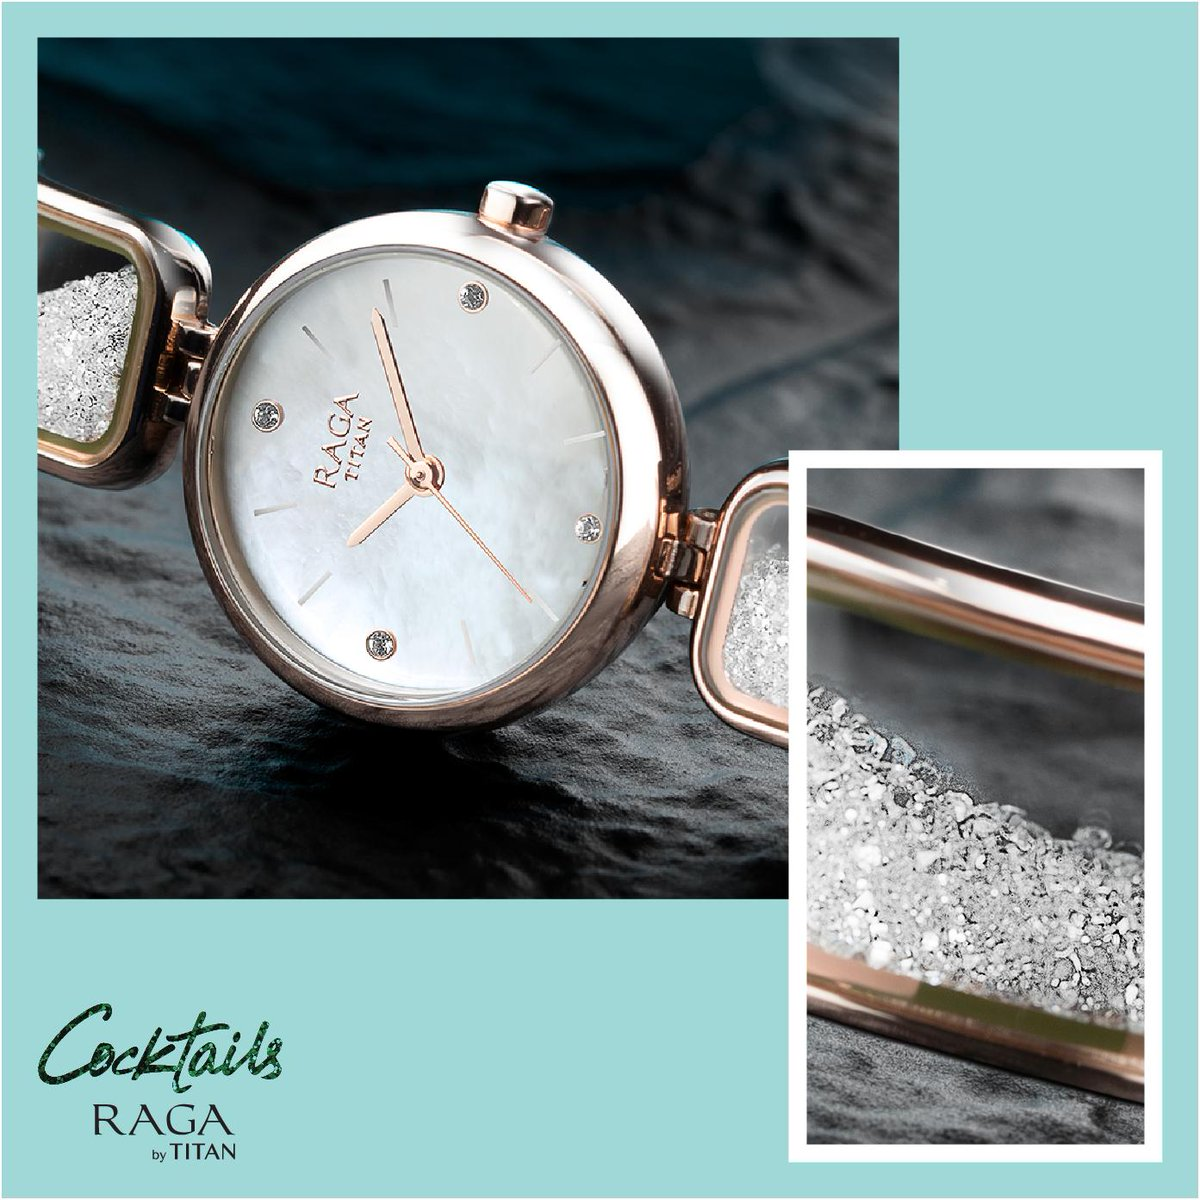 7c2b52ac2adbe Presenting Ecstasy, a timepiece with over 1200 #Swarovski crystals ...